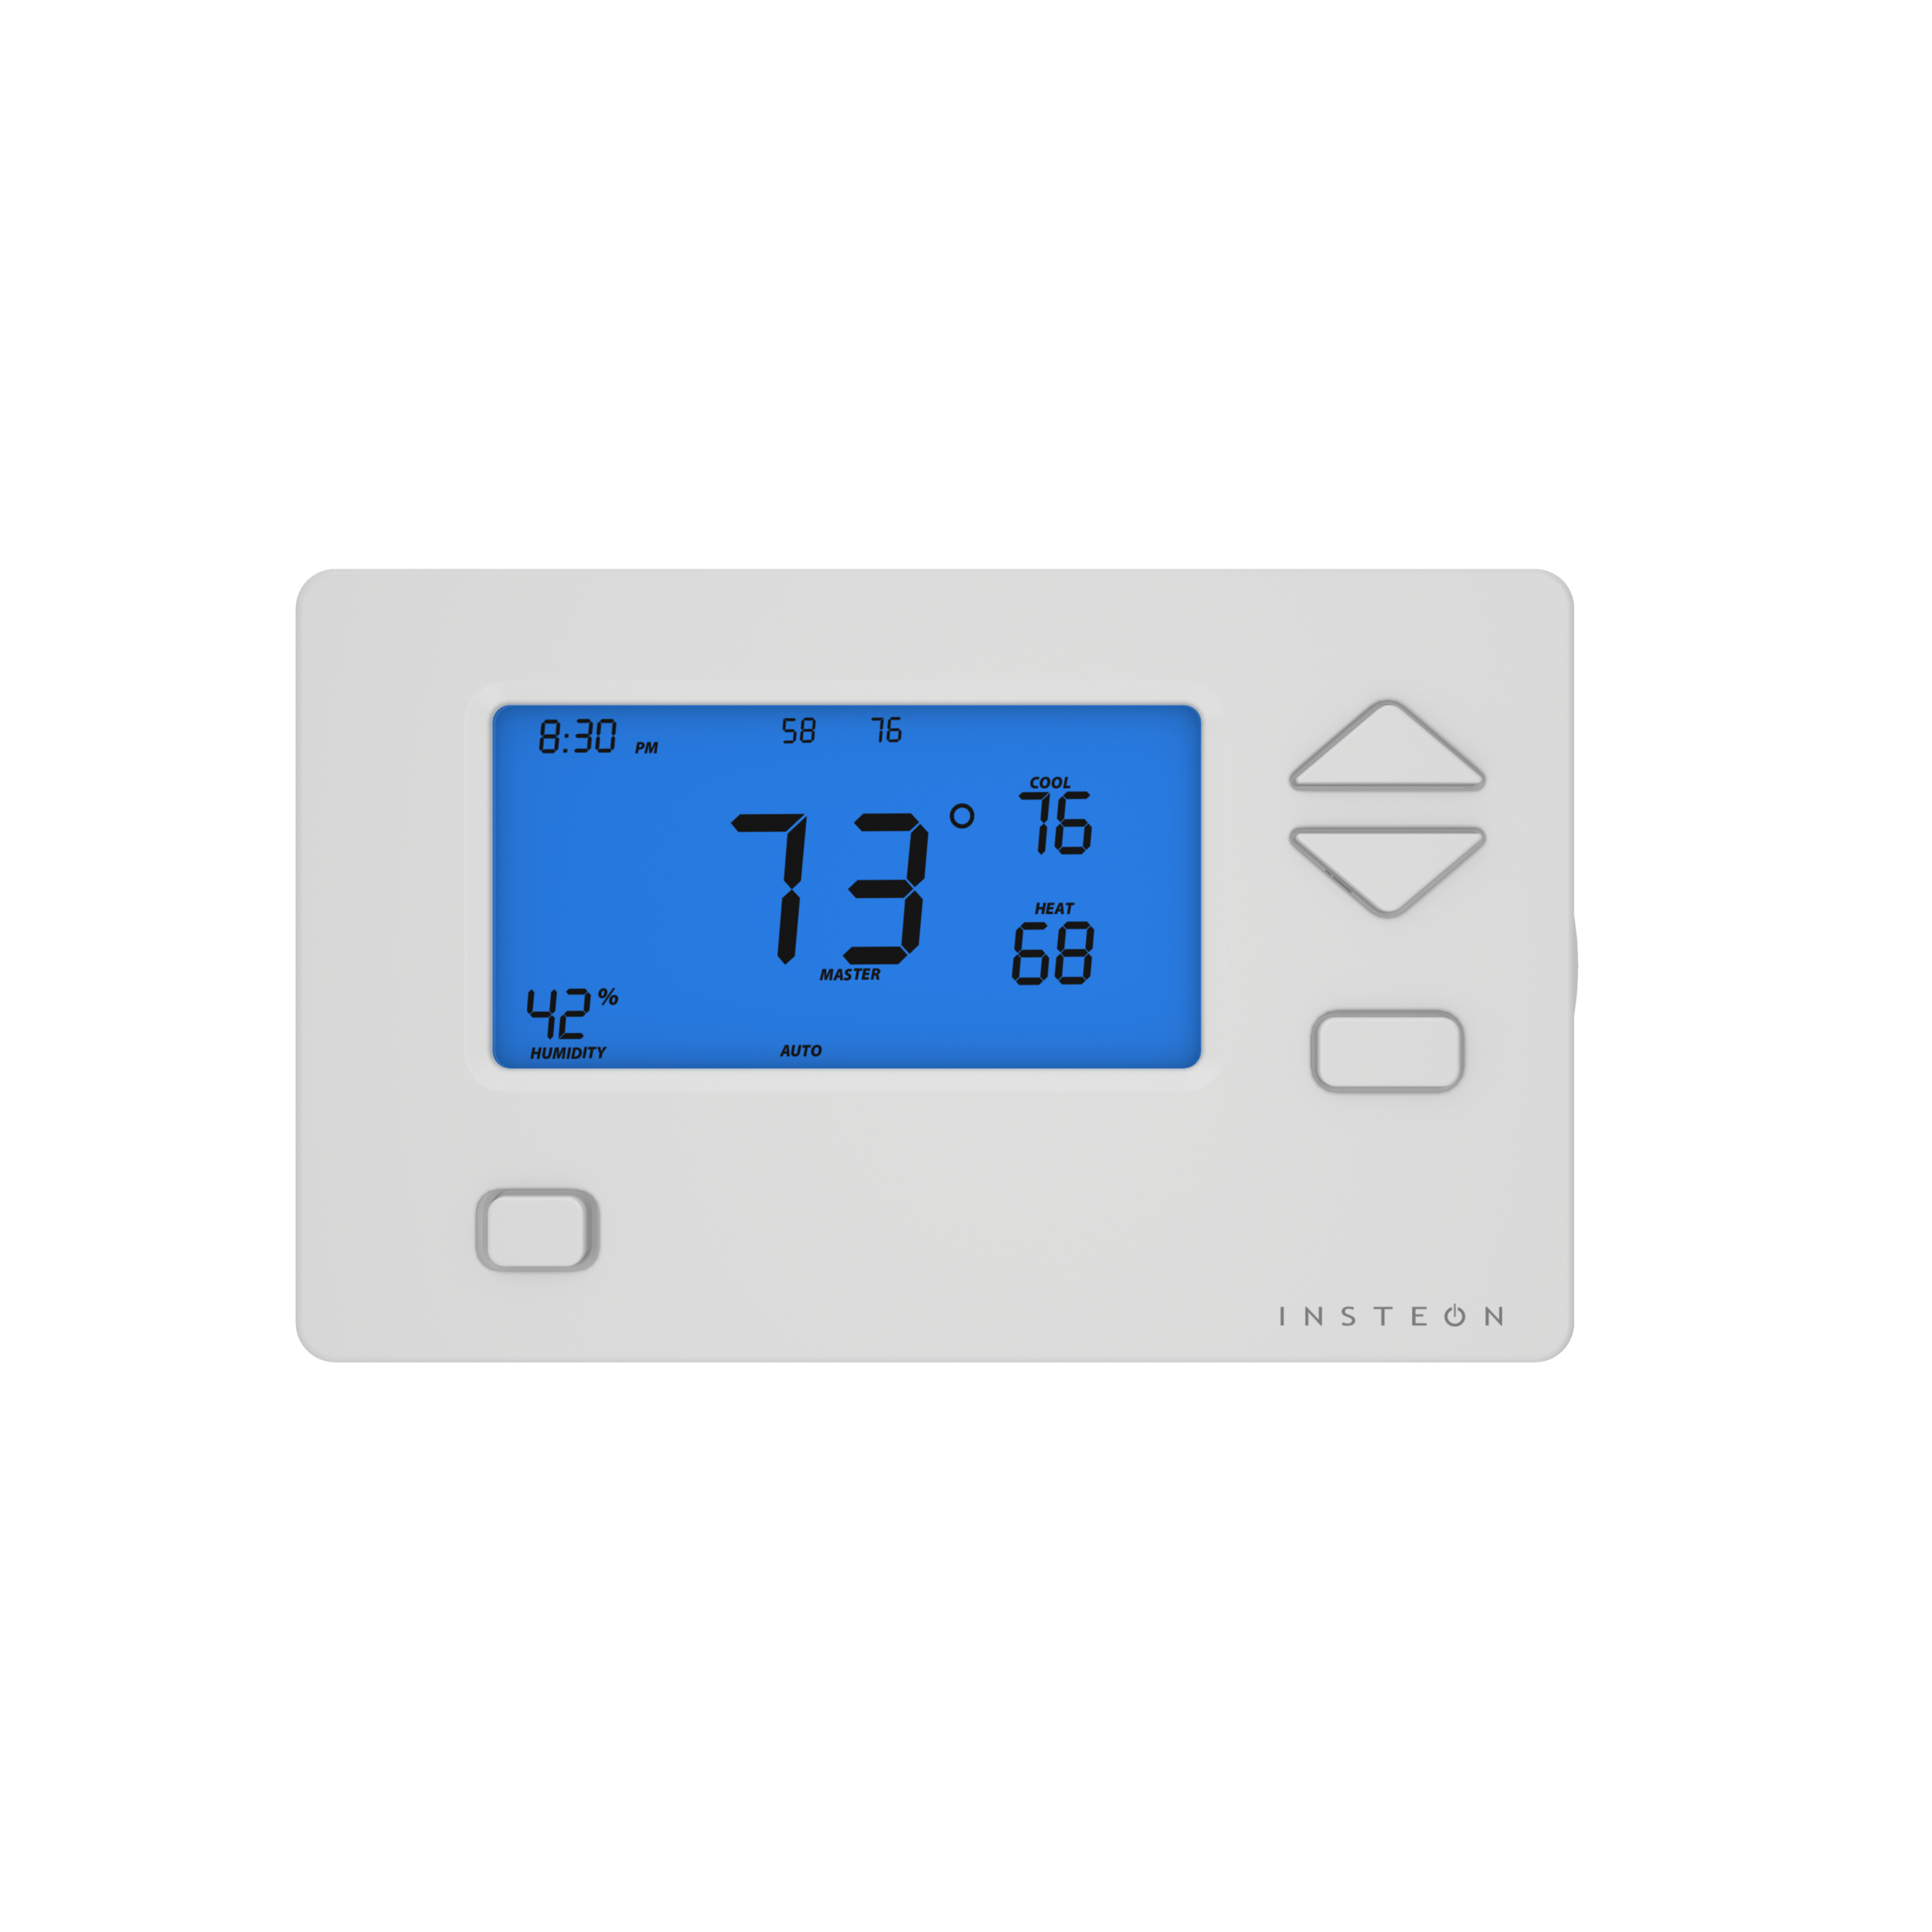 wired thermostat setup insteon rh insteon com